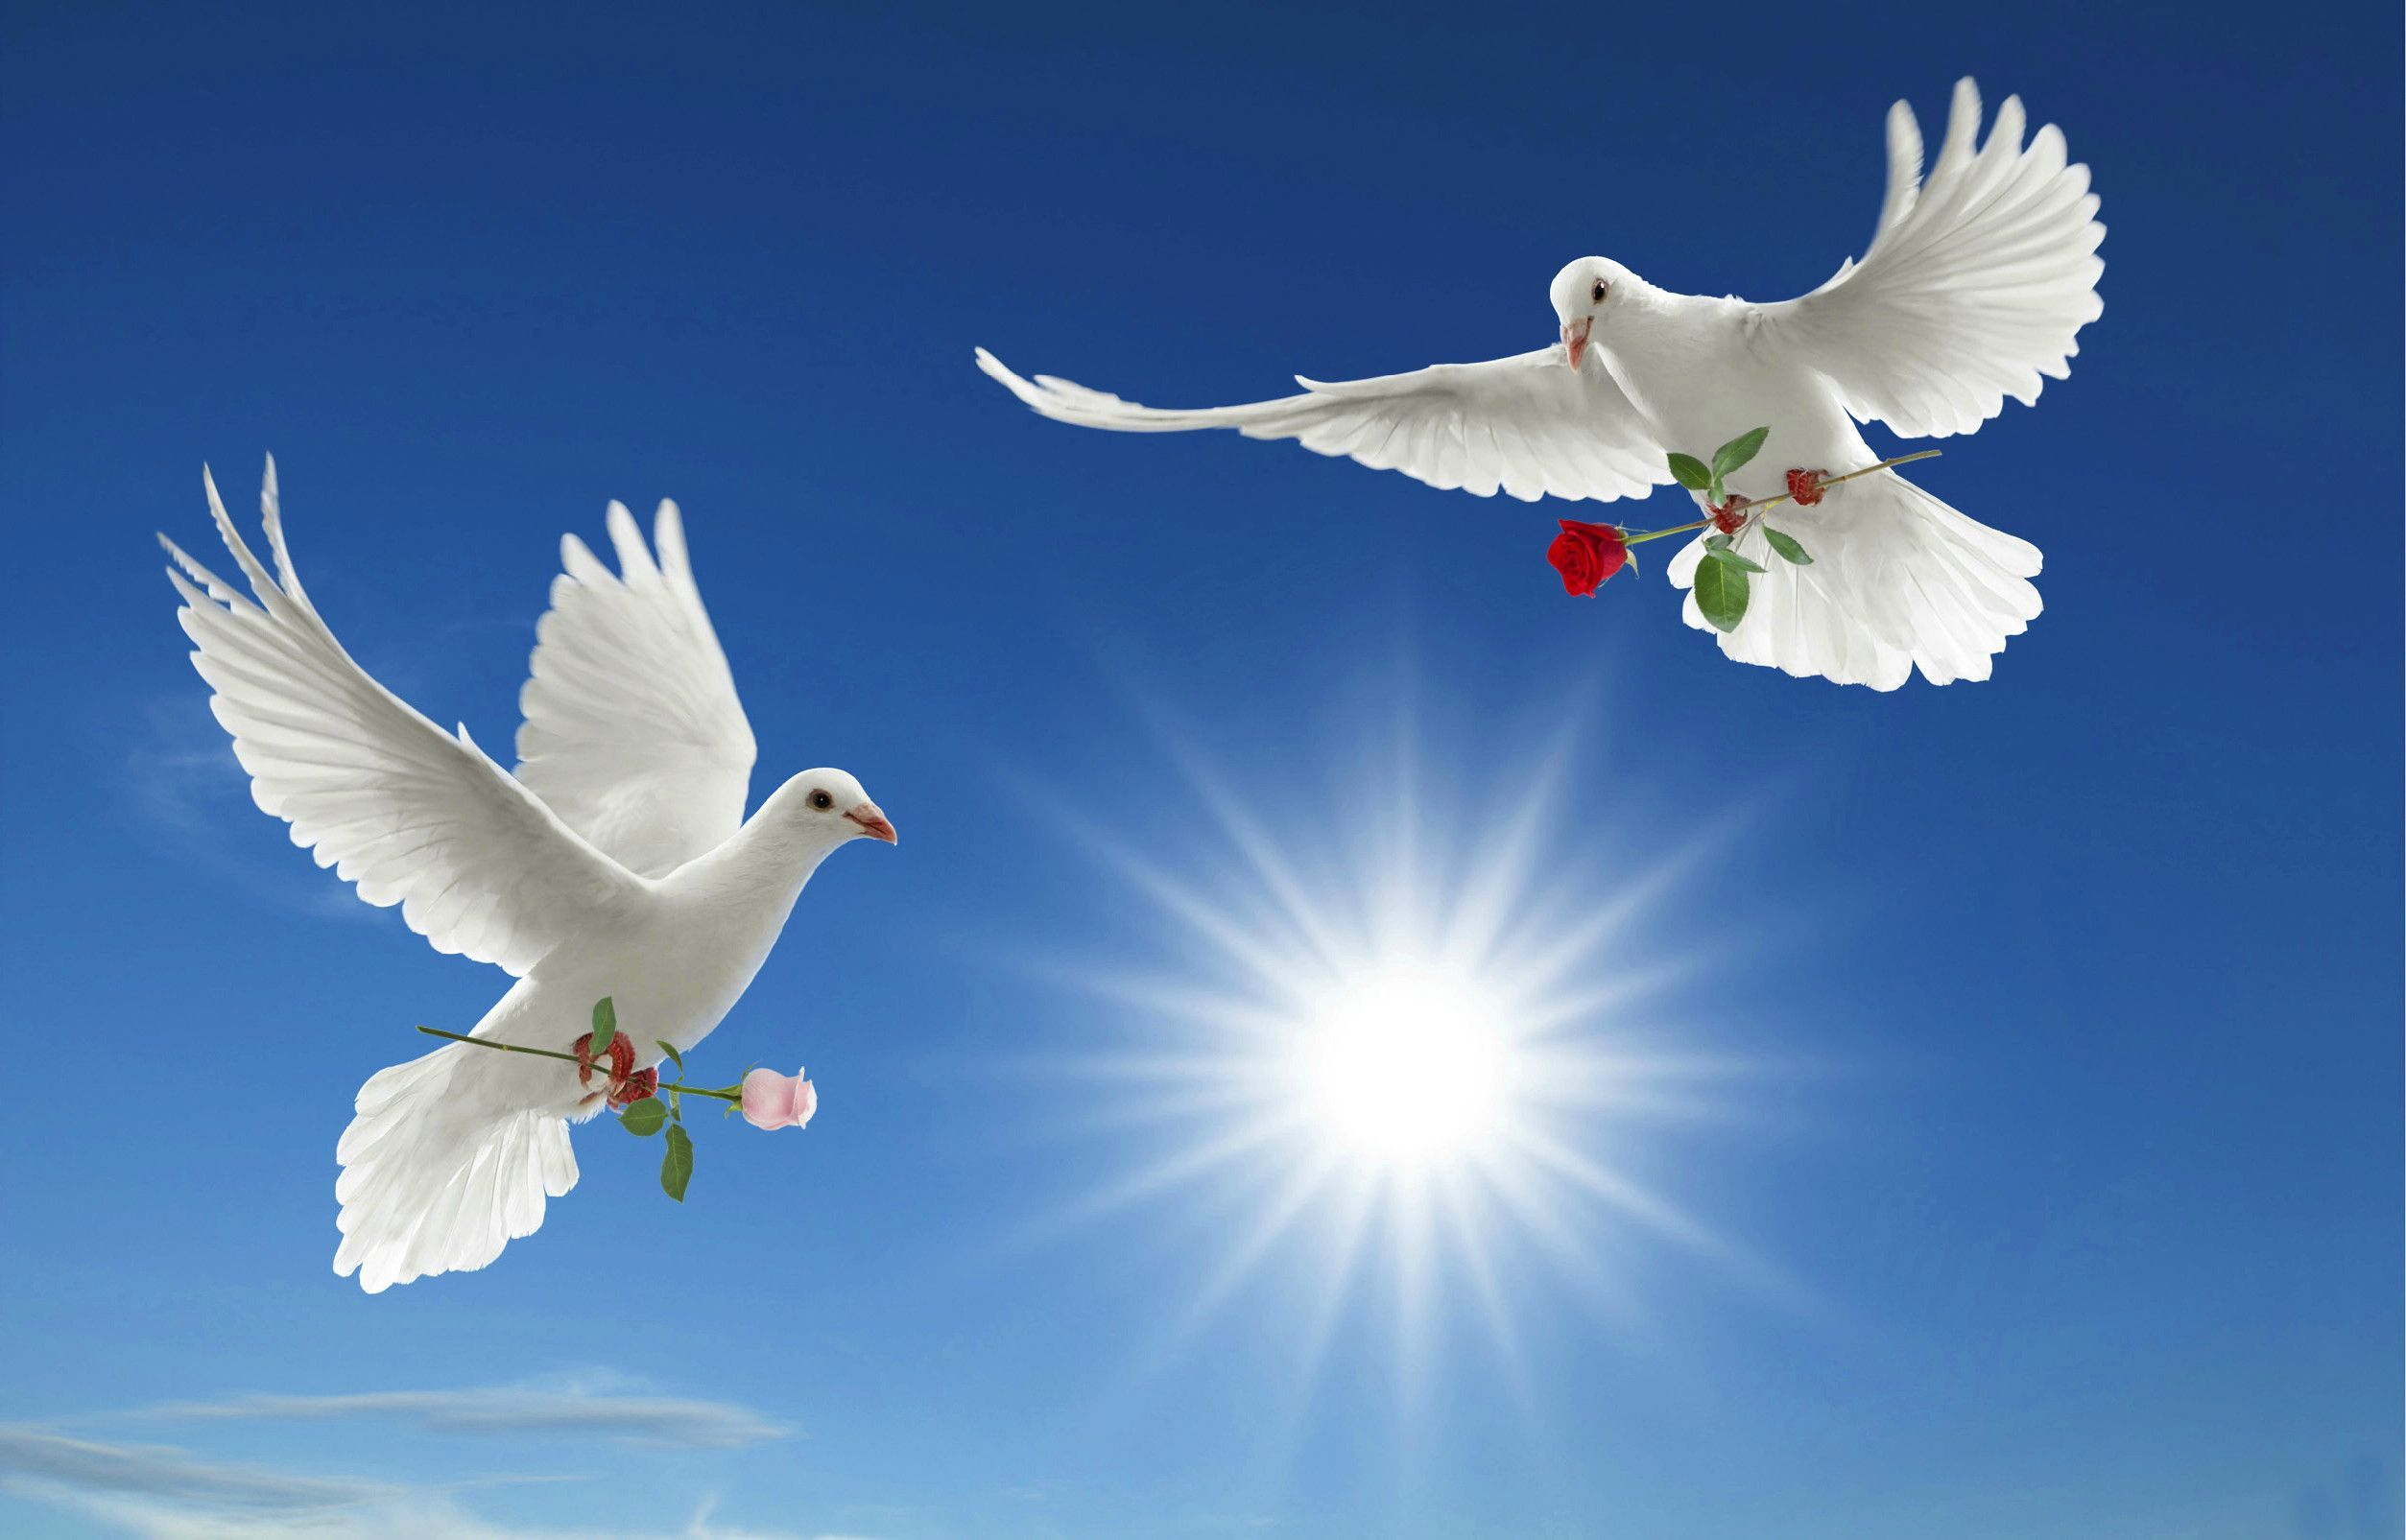 God Is Guiding Us Sri Ramana Maharshi Dove Wallpaper Bird Wallpaper Dove Images